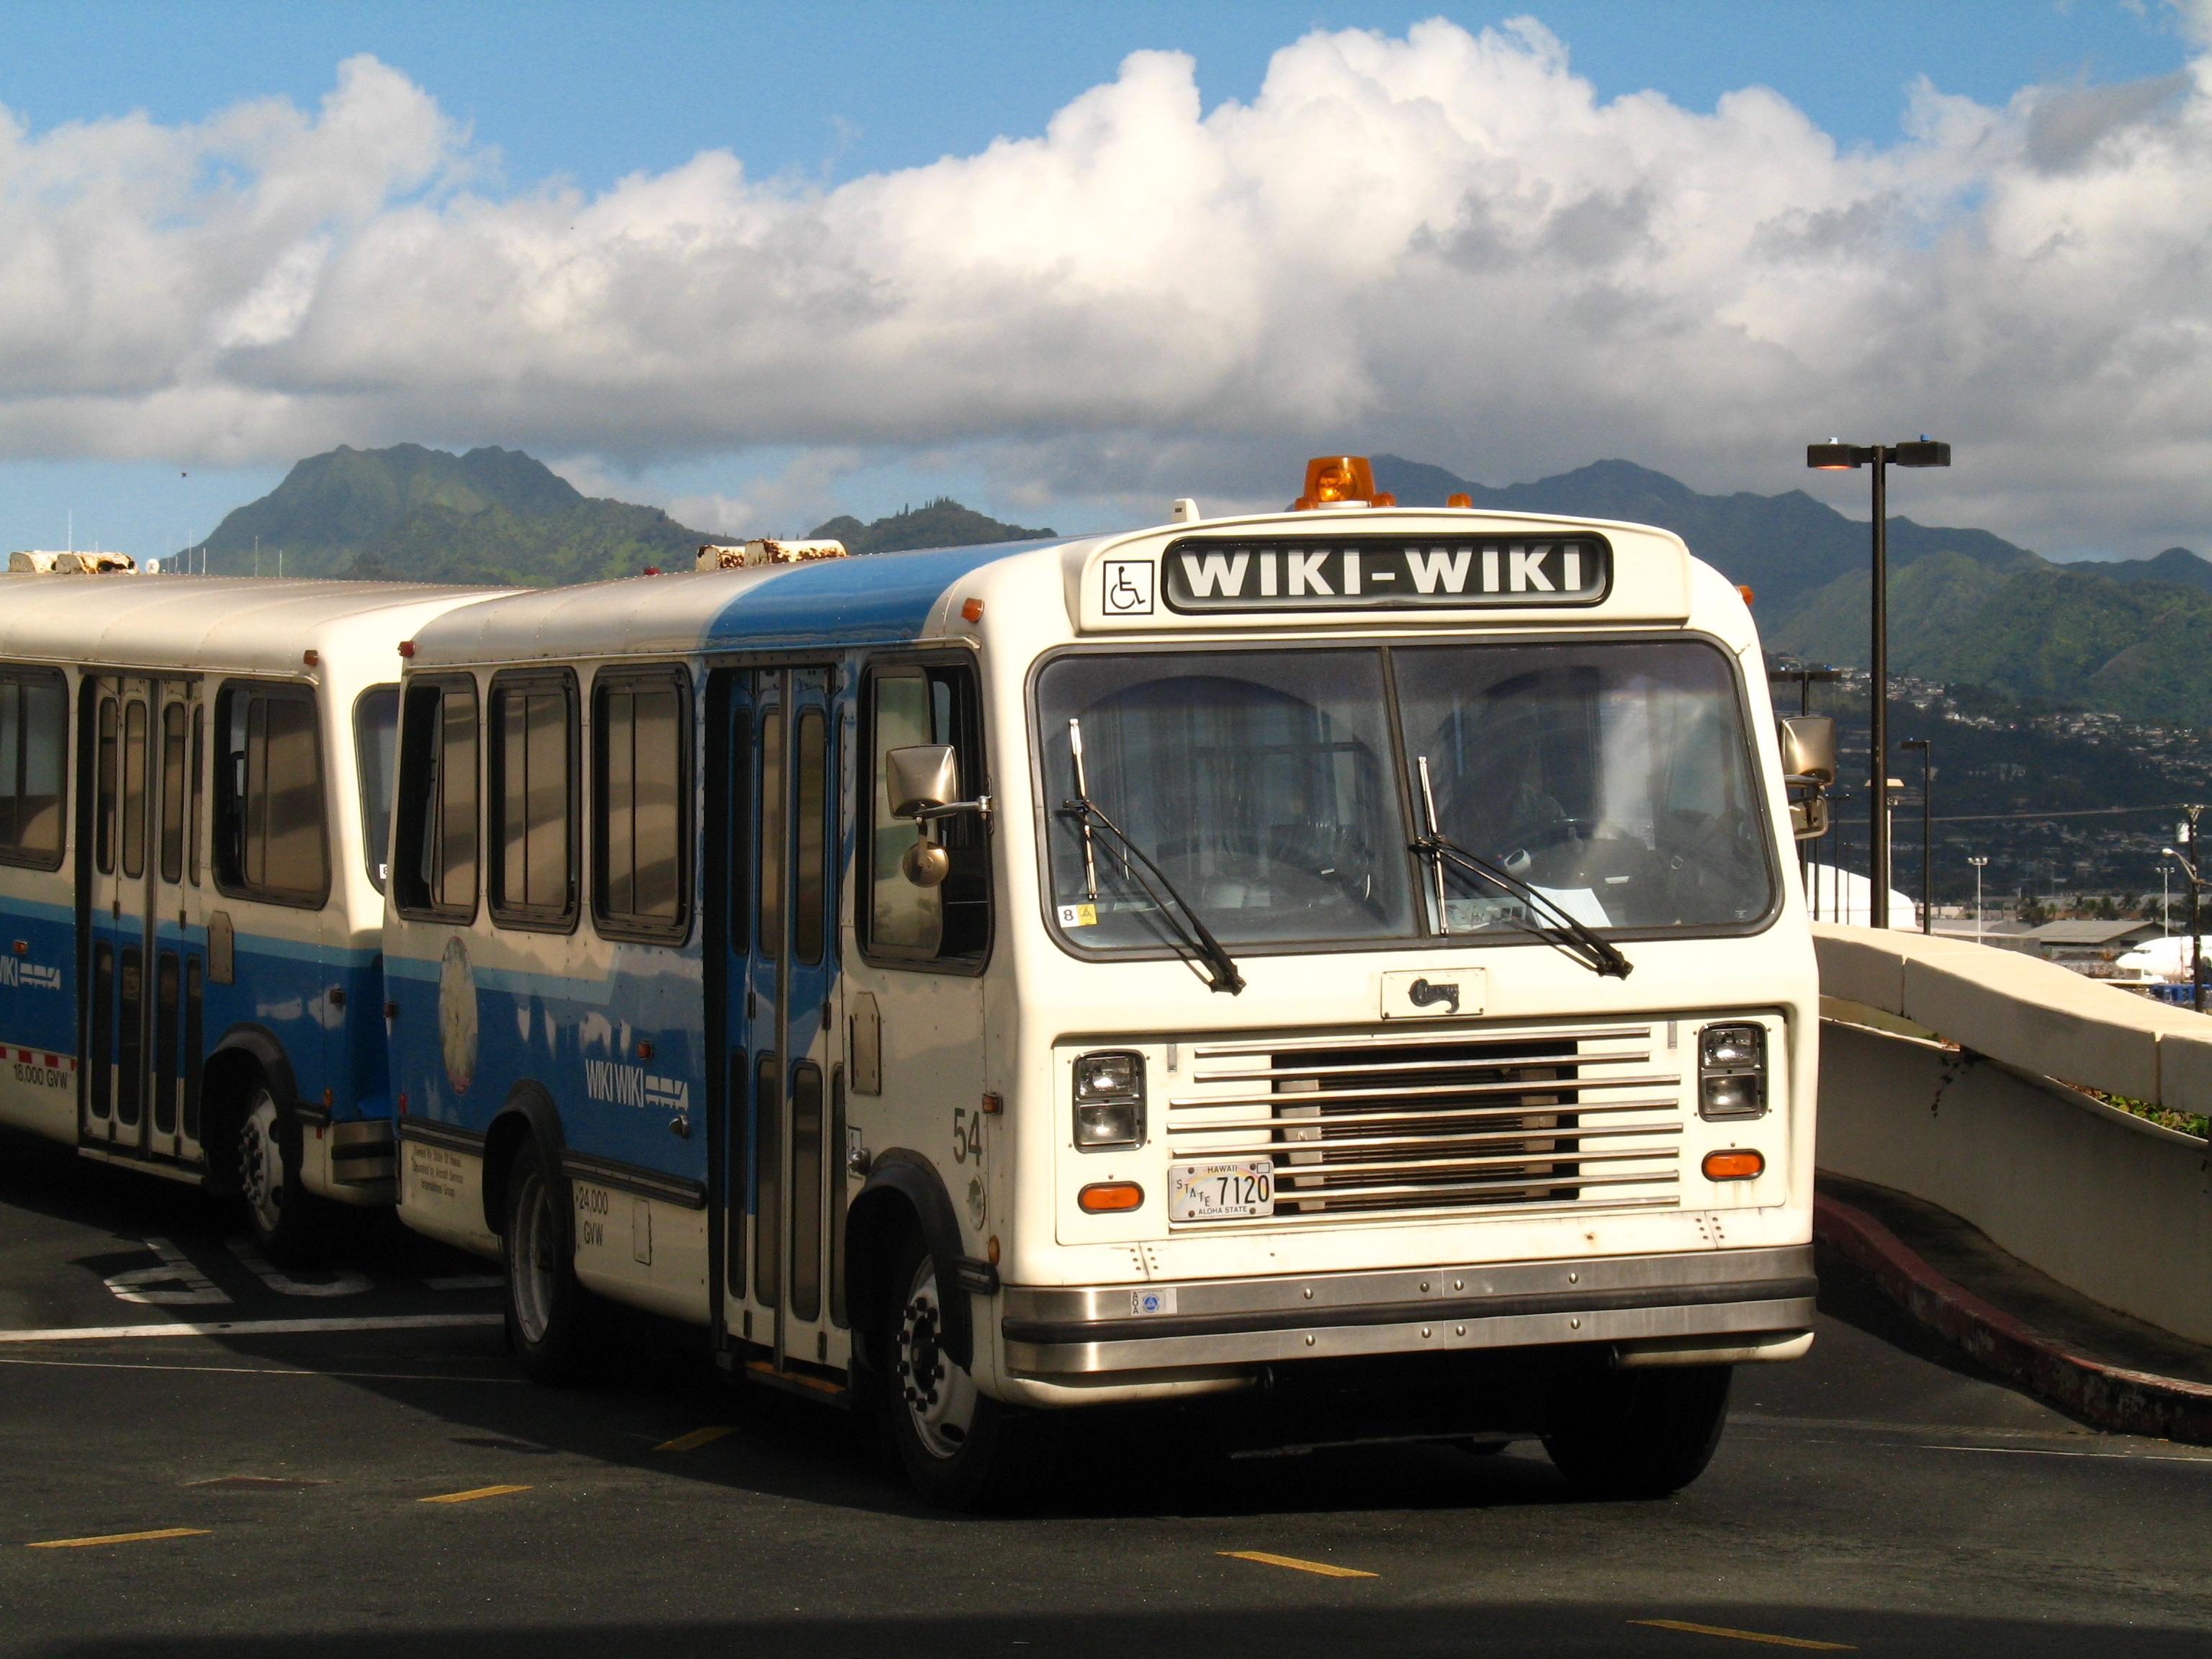 Autobús wiki-wiki de Honolulu